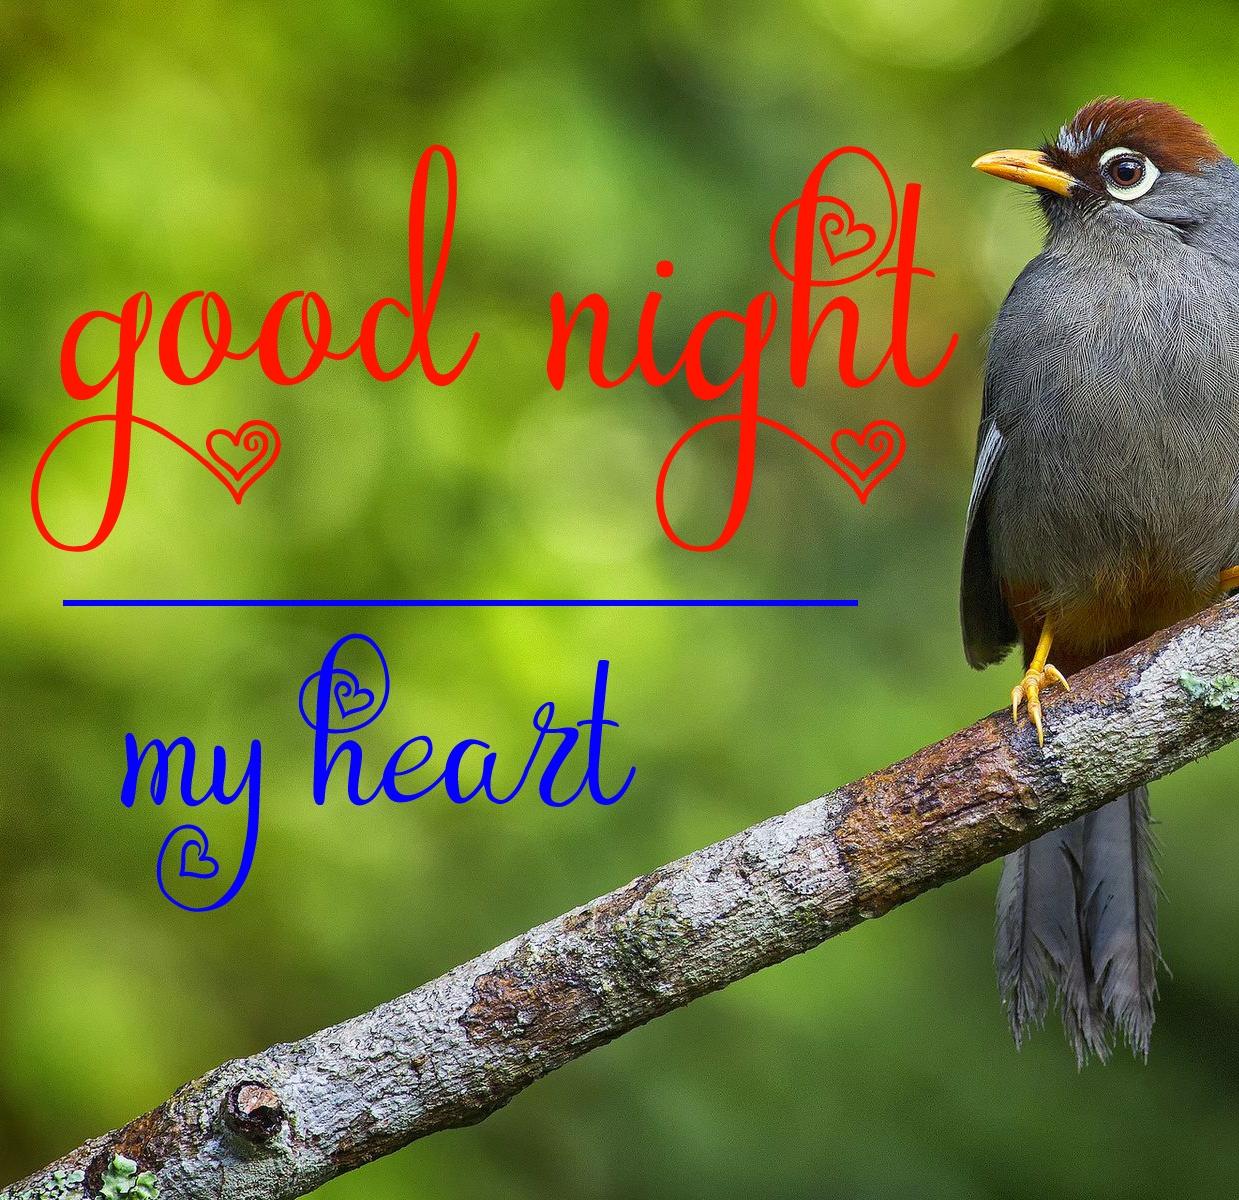 Free good night Images 23